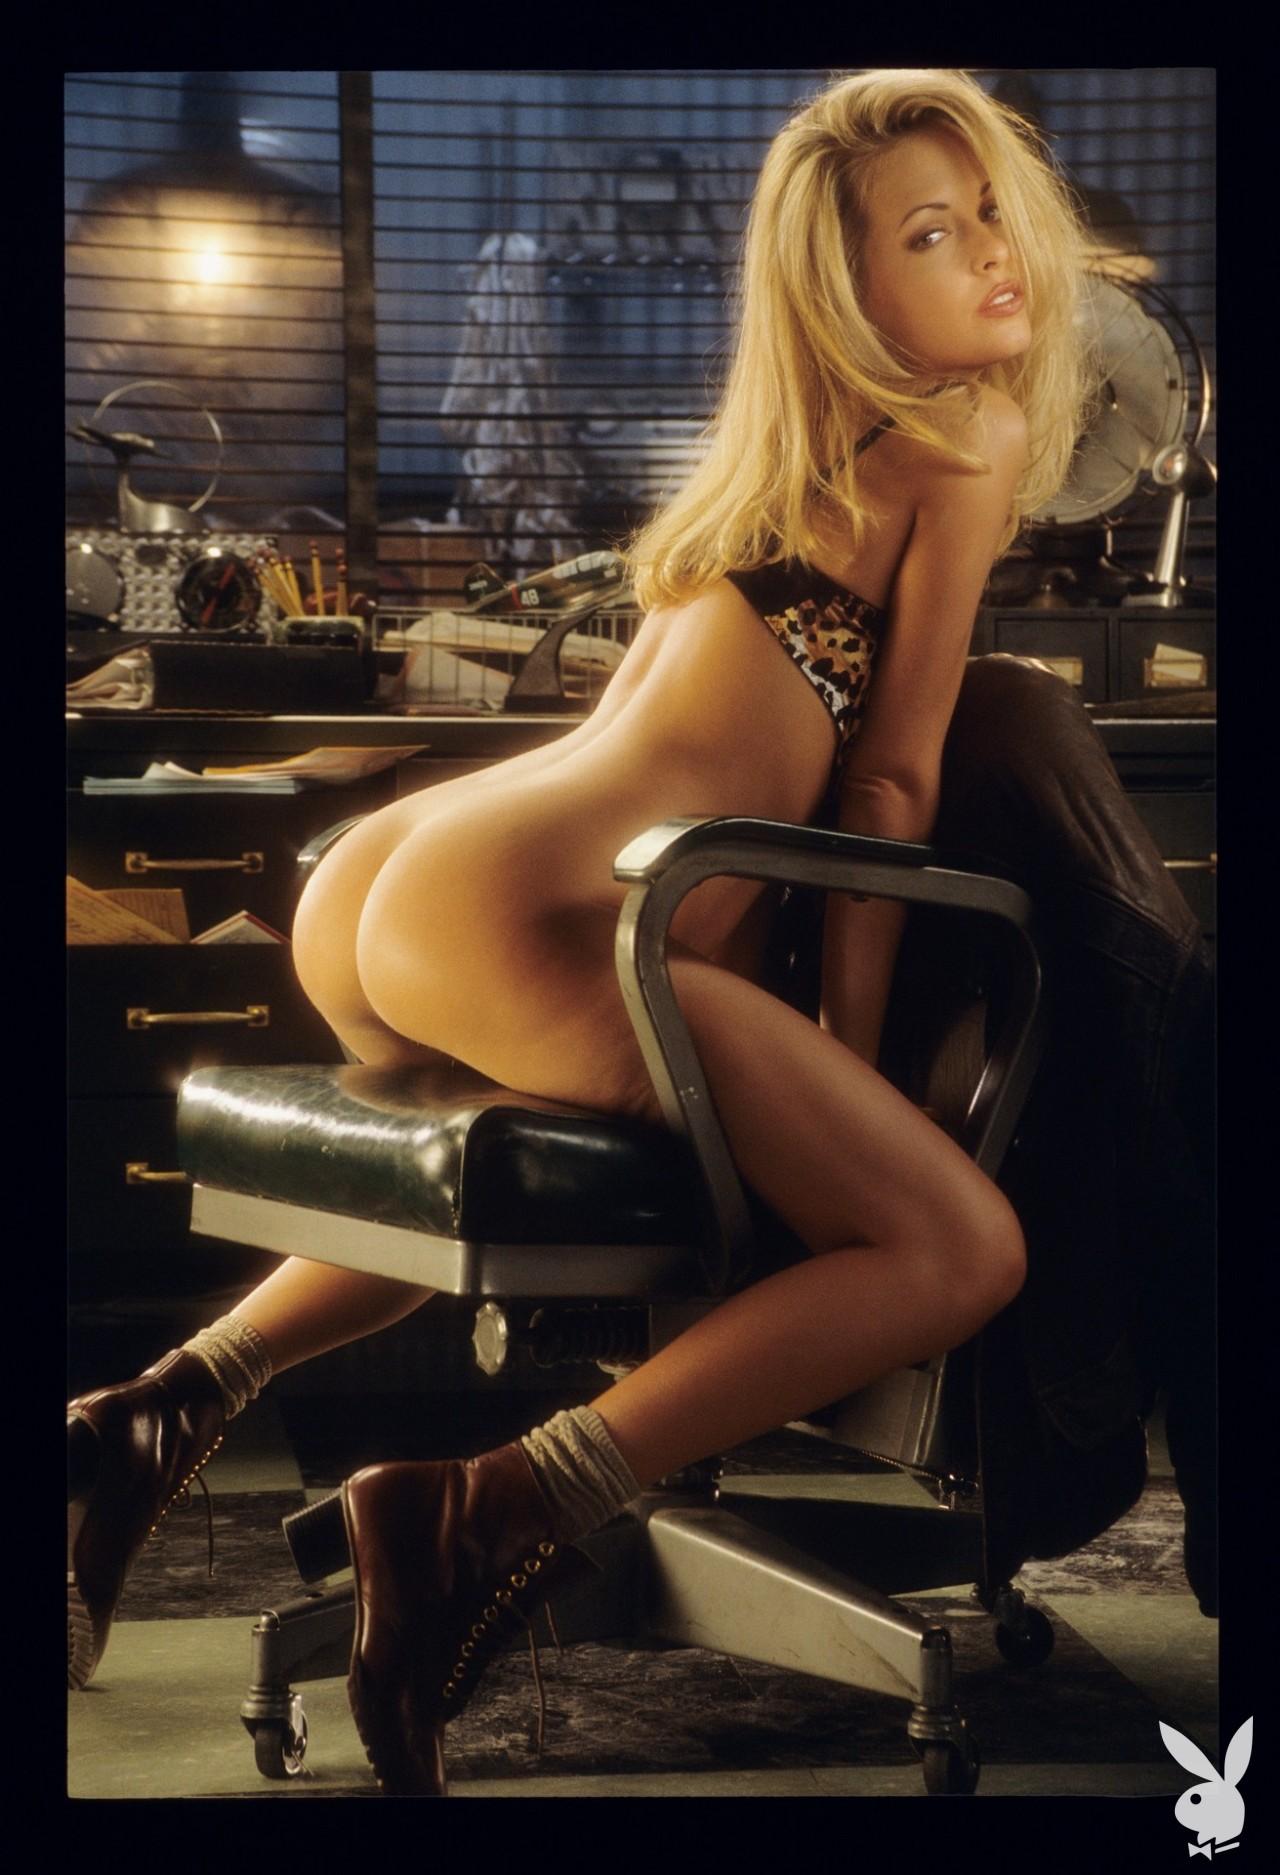 Playmate June 1995 Rhonda Adams Playboy Plus (8)